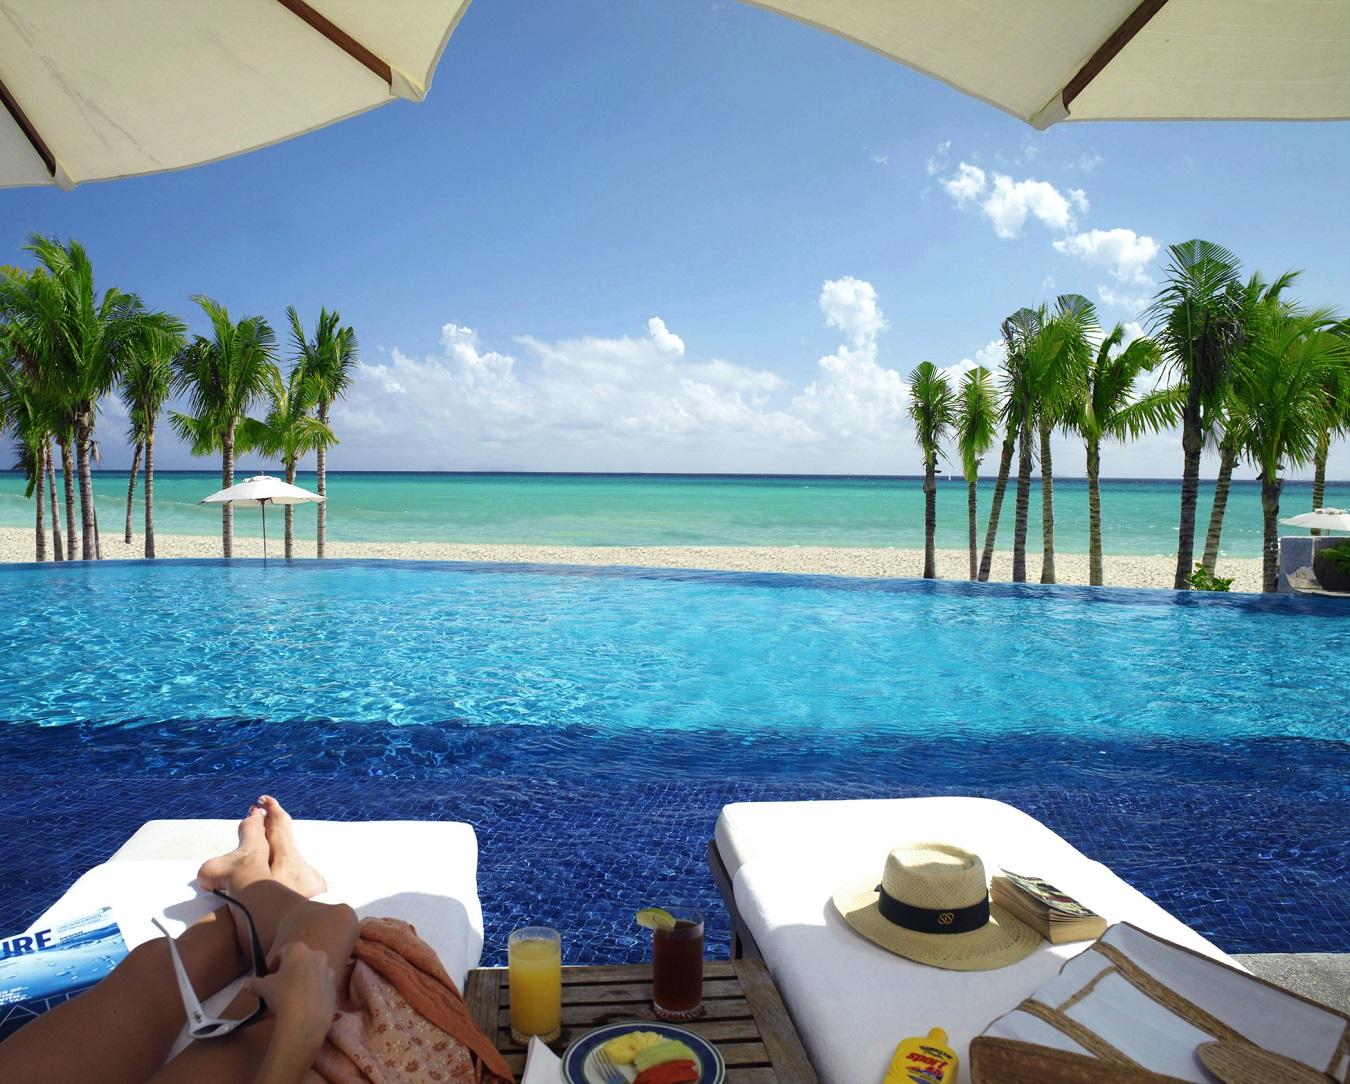 Royal Hideaway pool and beach view